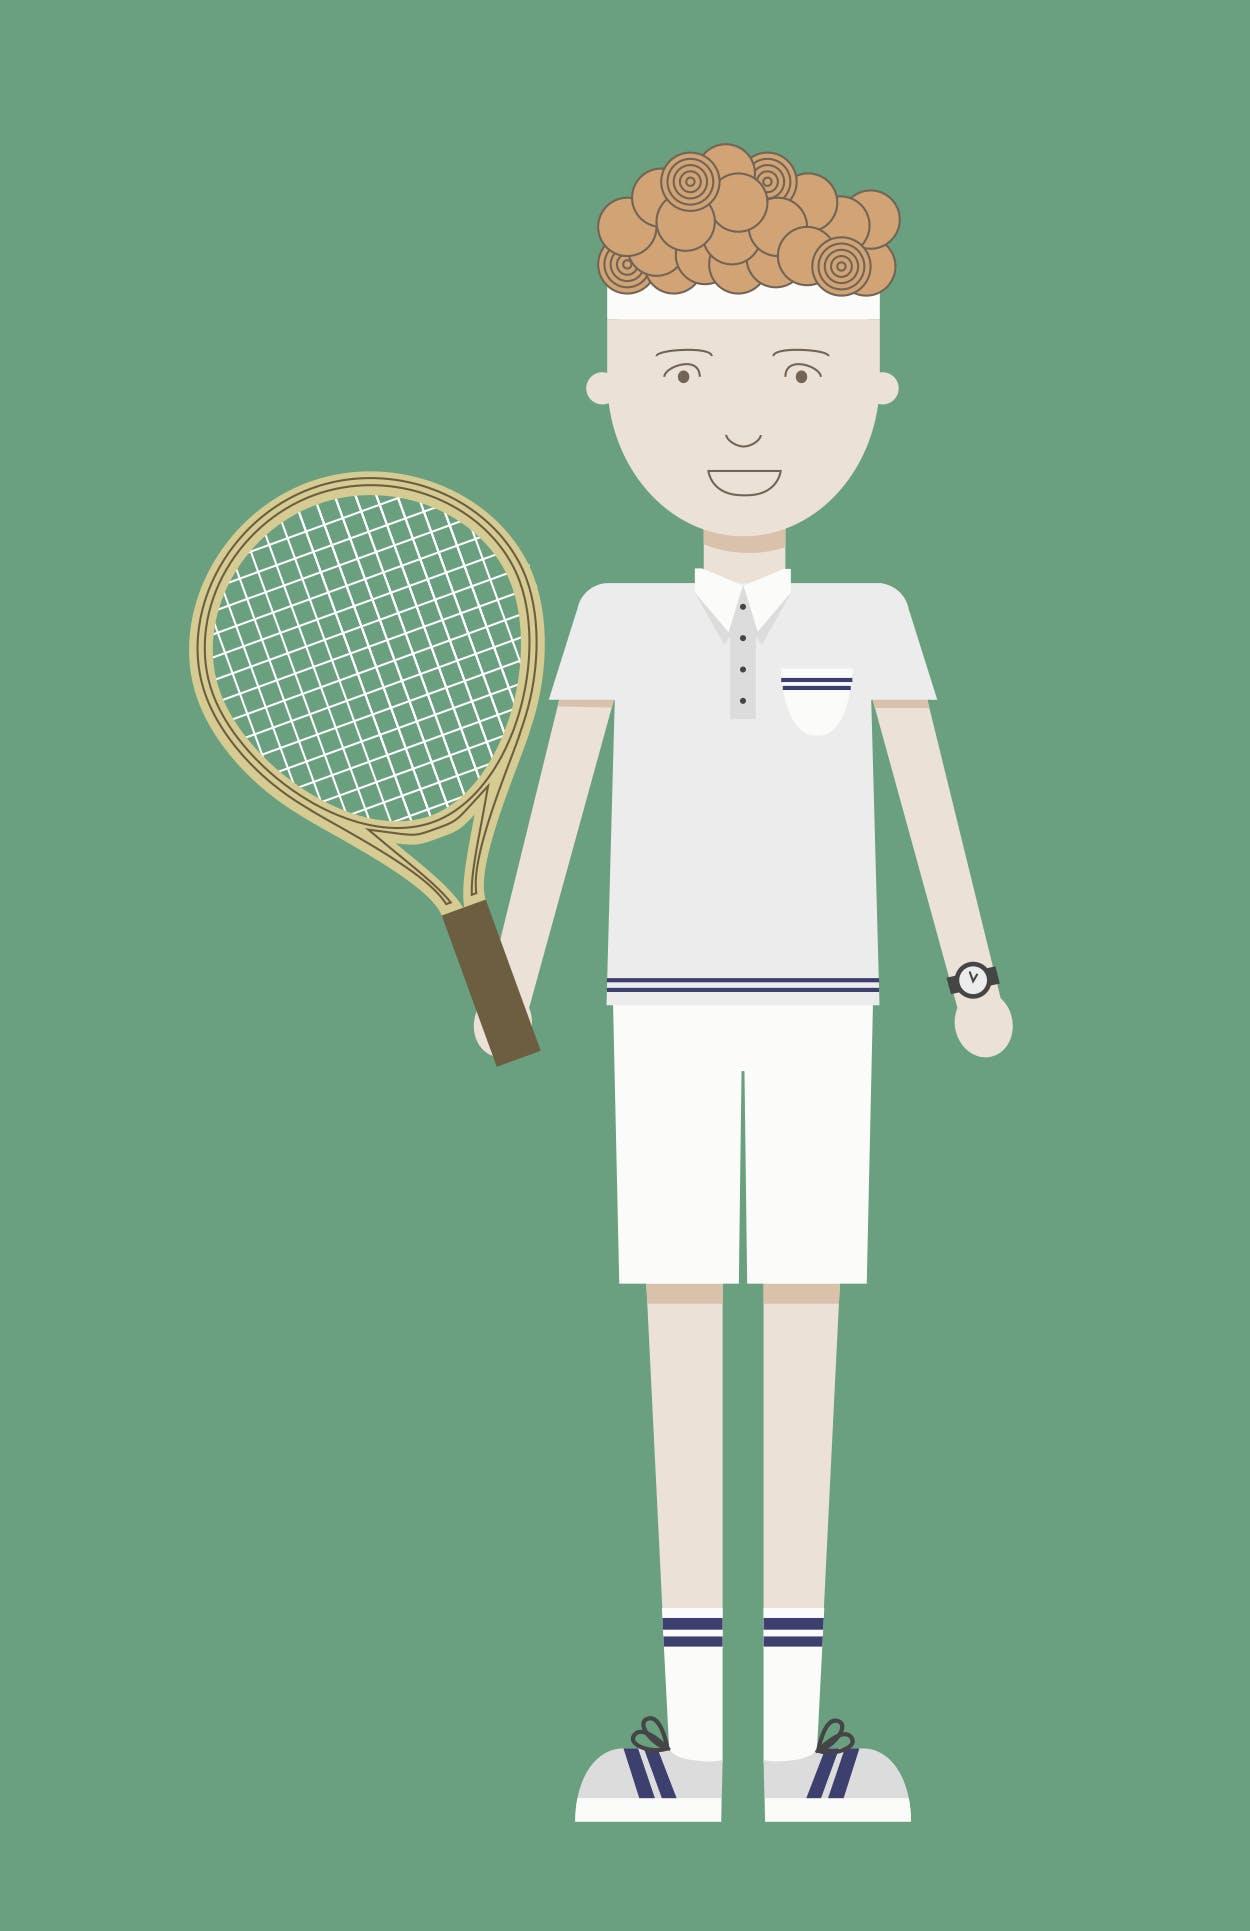 Tennis Tracker